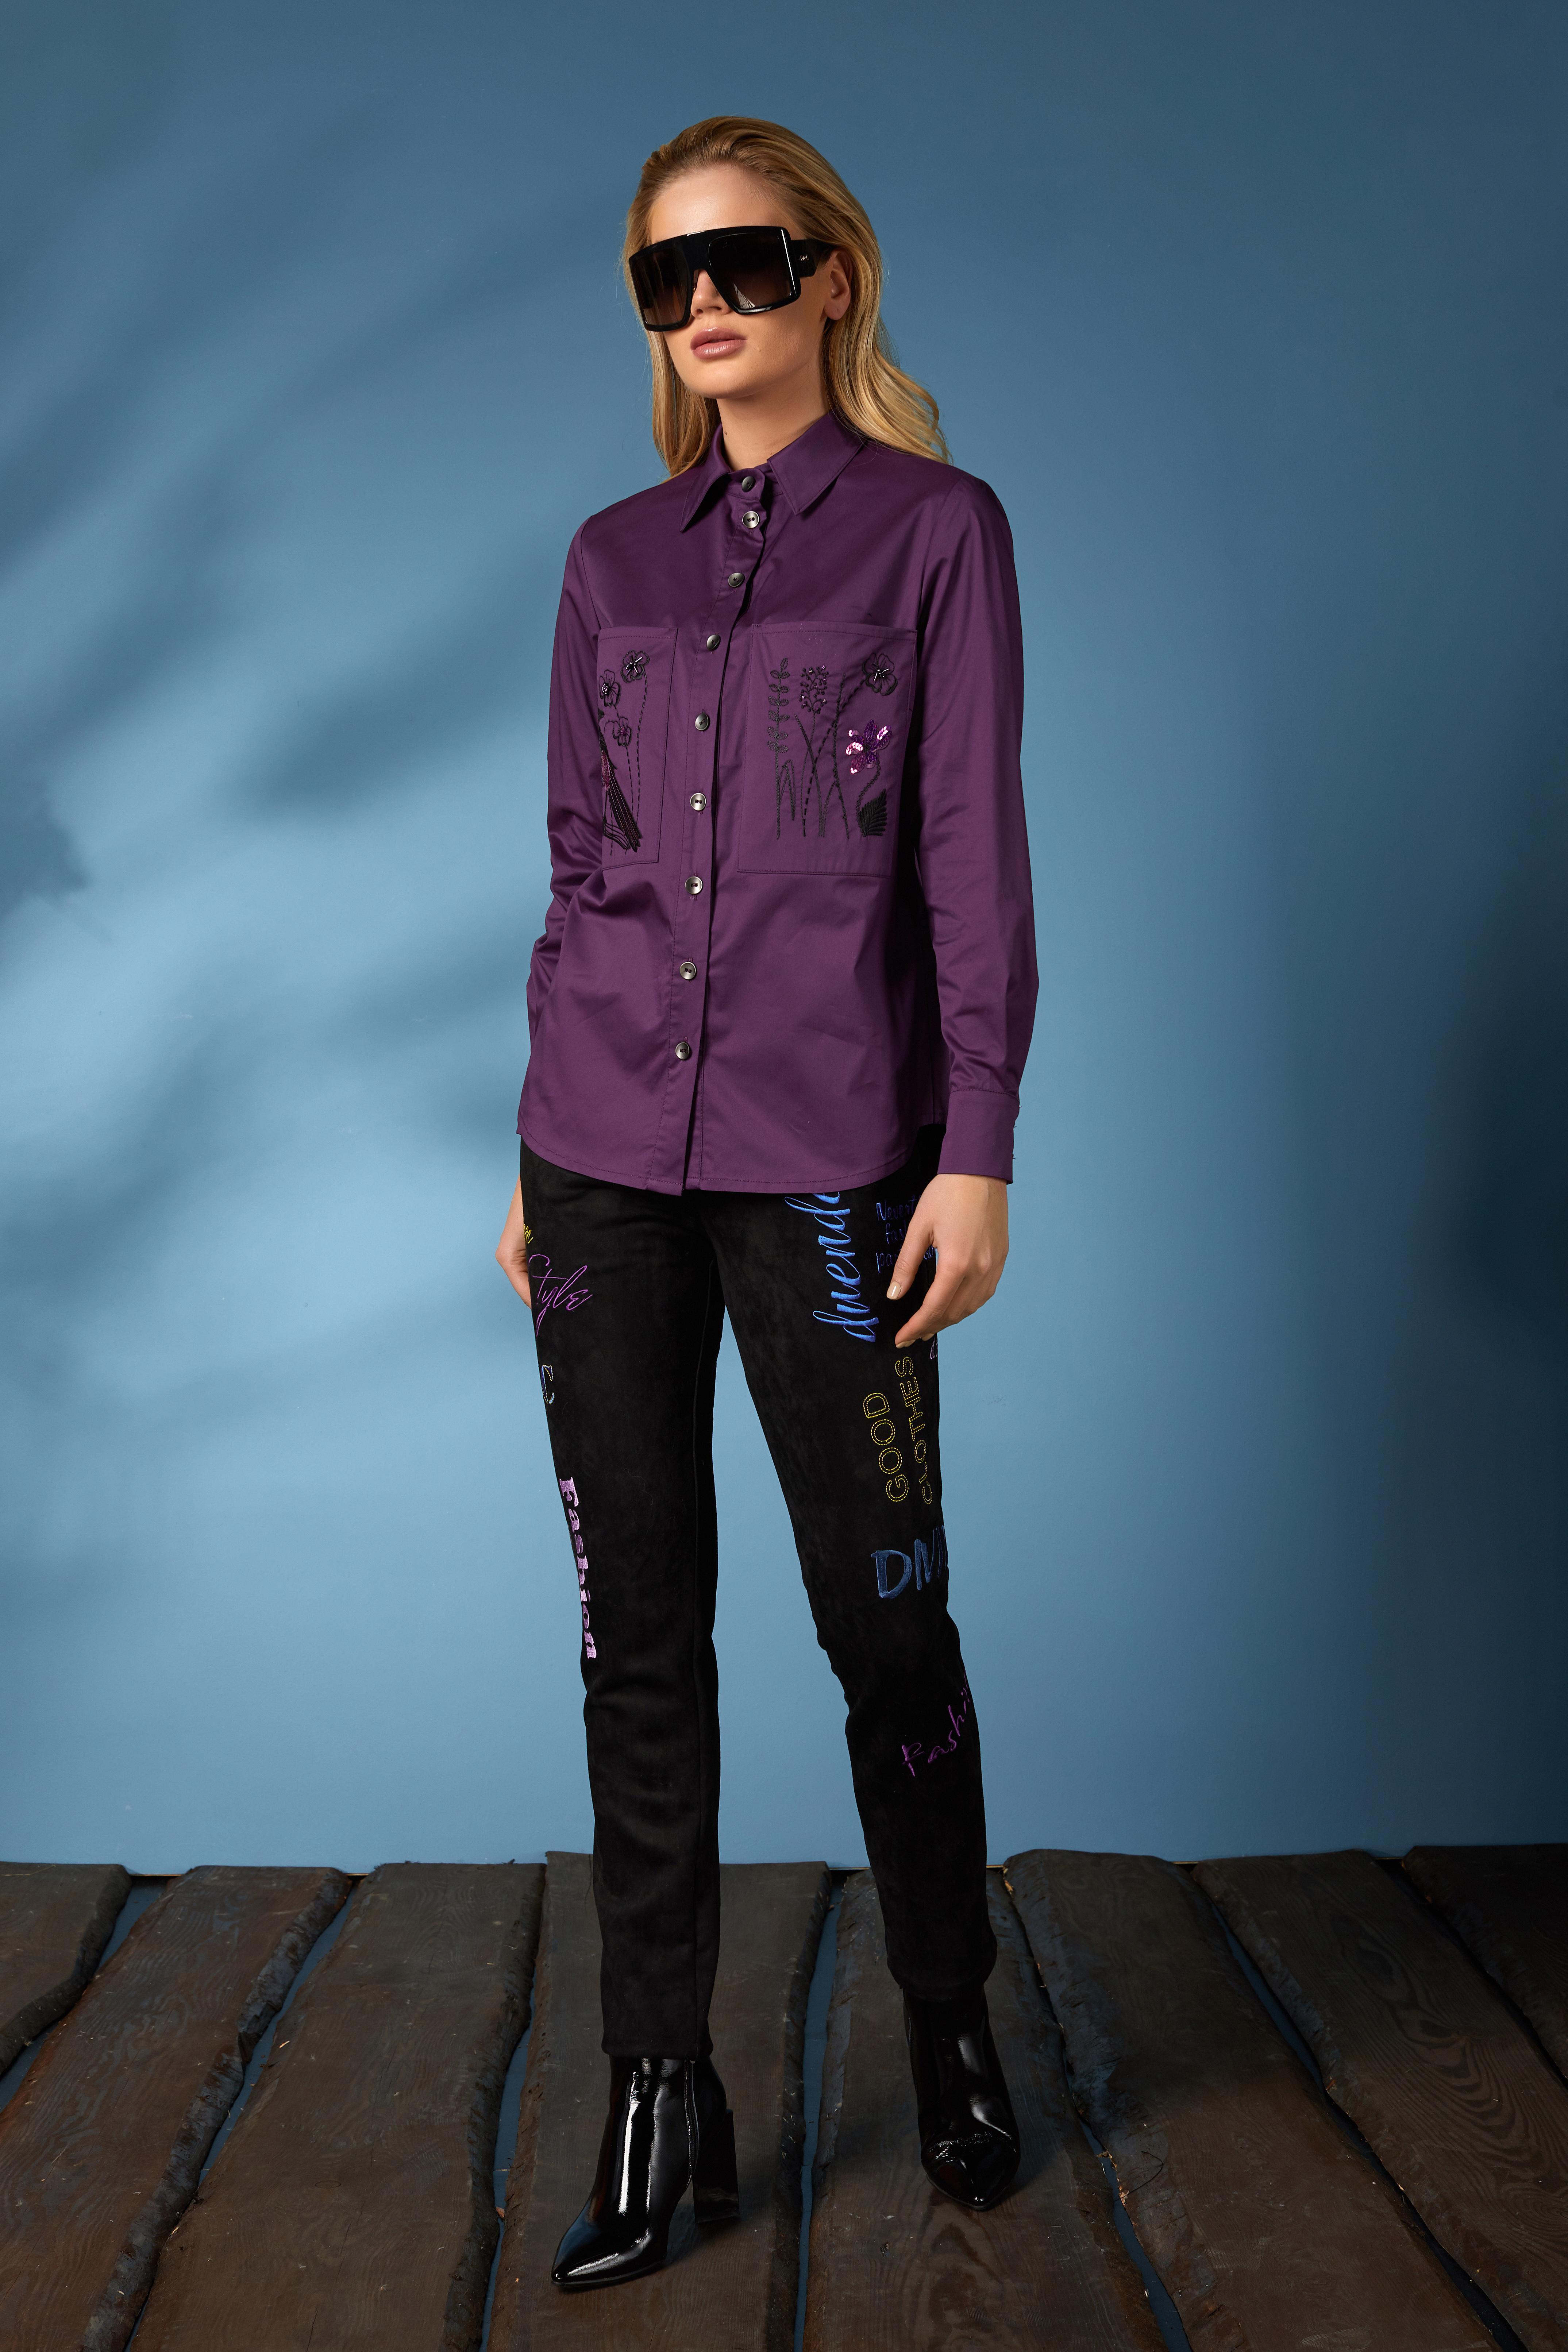 Рубашка 619-2, джинсы 631 (3)